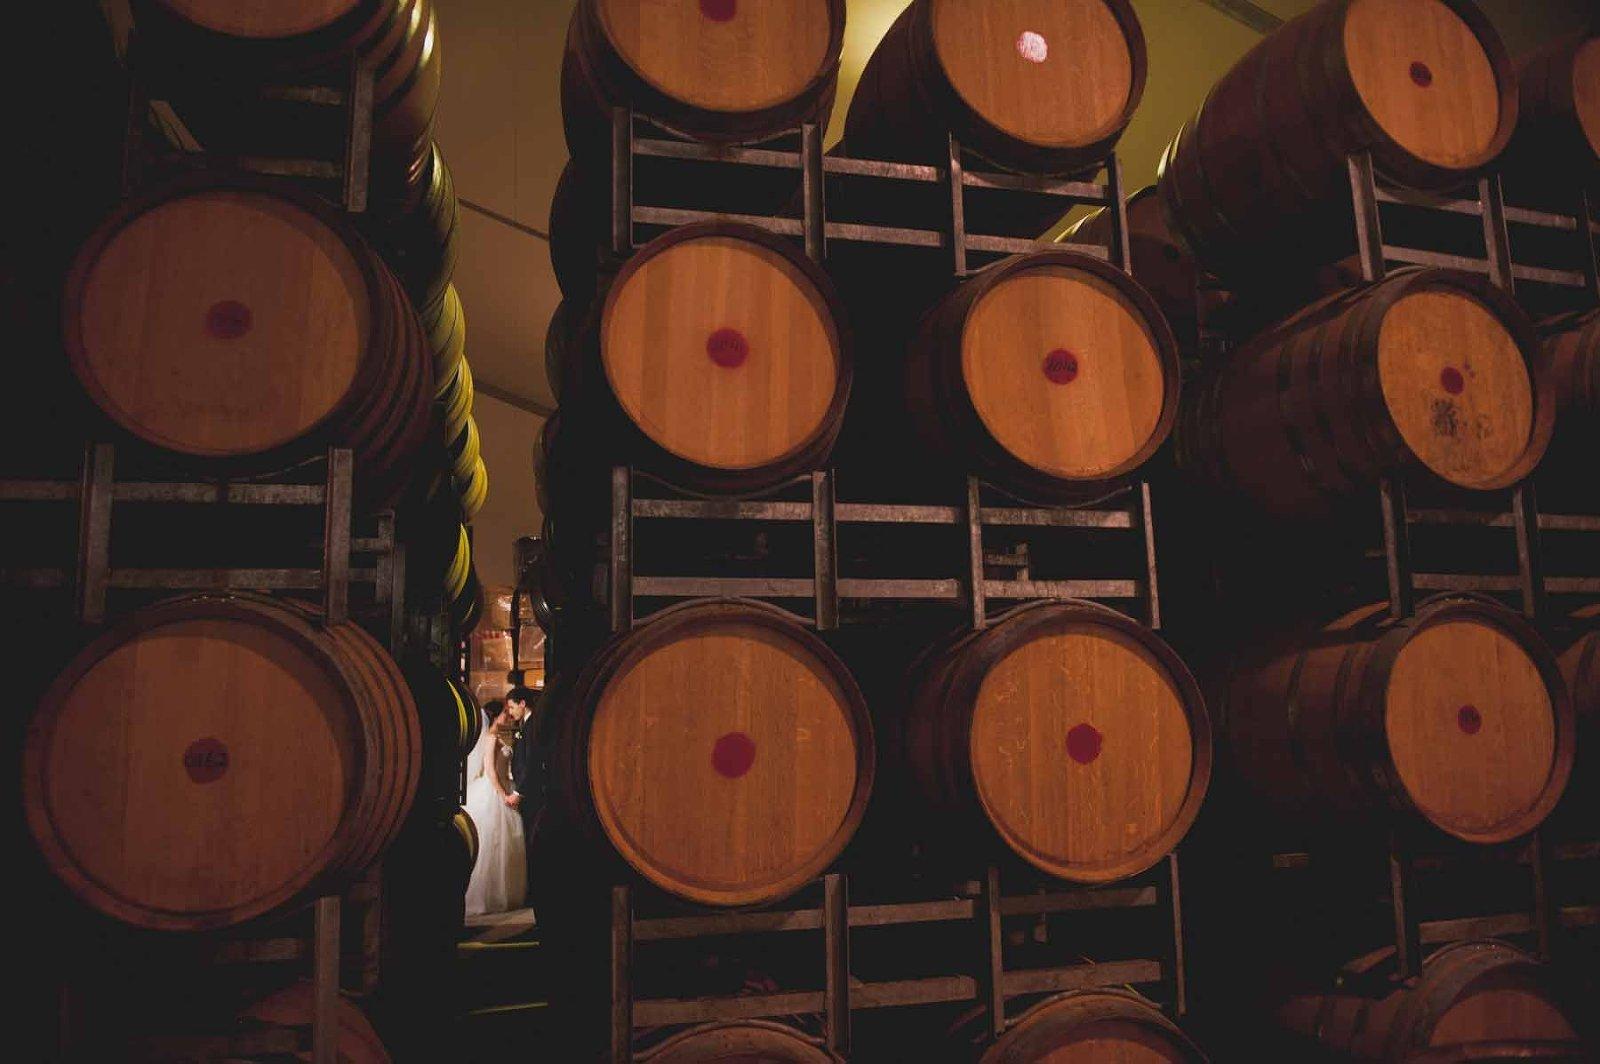 Brisbane wedding reception venue Sirromet winery - barrel room